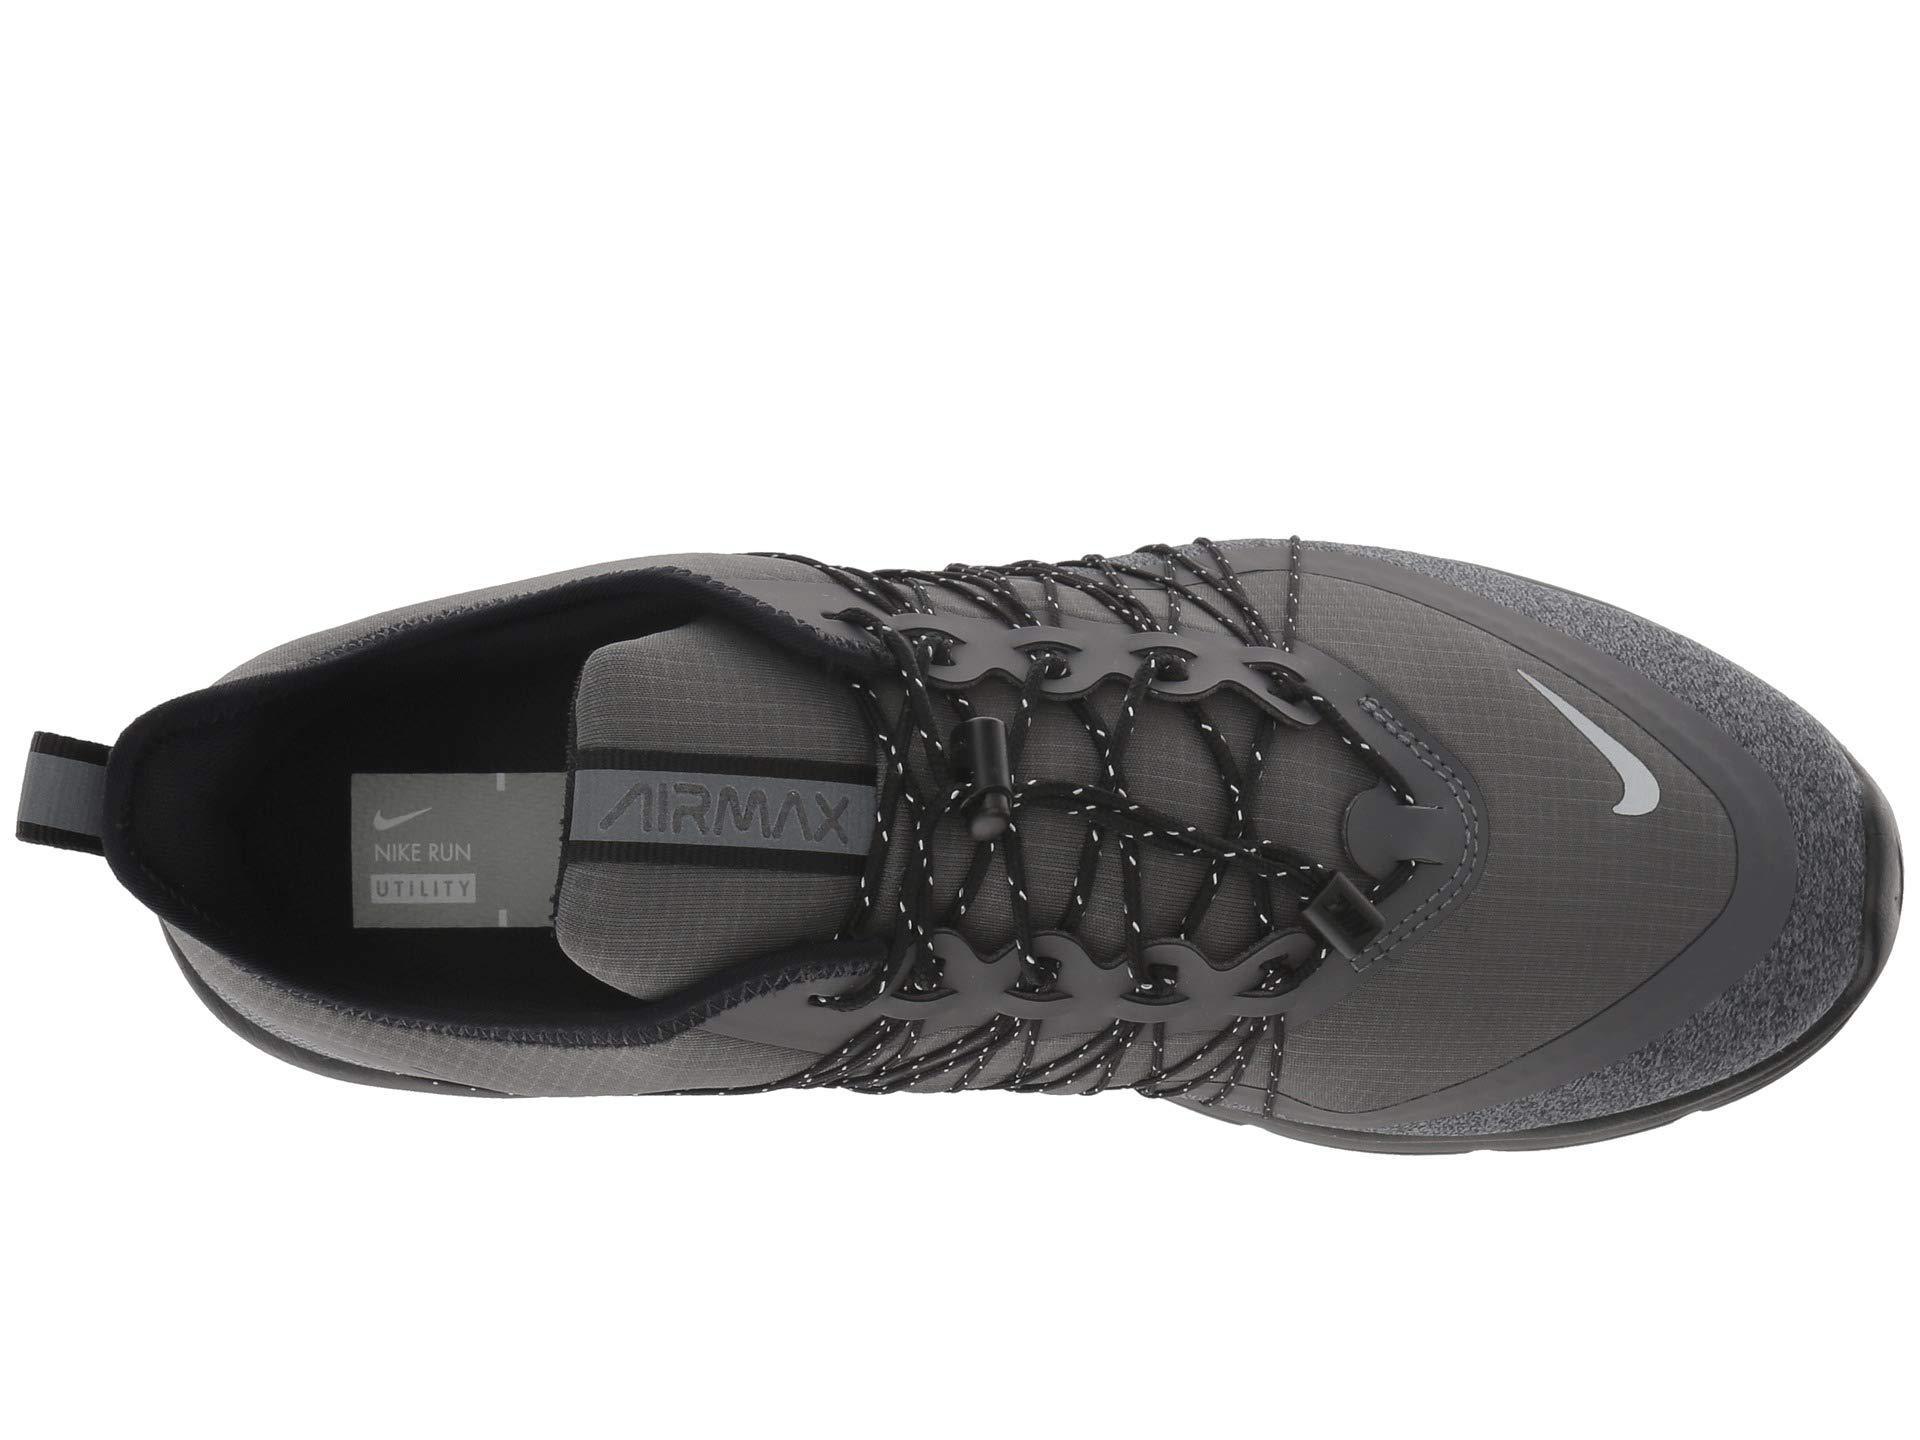 47ffd4f8059 Nike - Air Max Sequent 4 Shield (dark Grey metallic Silver black). View  fullscreen